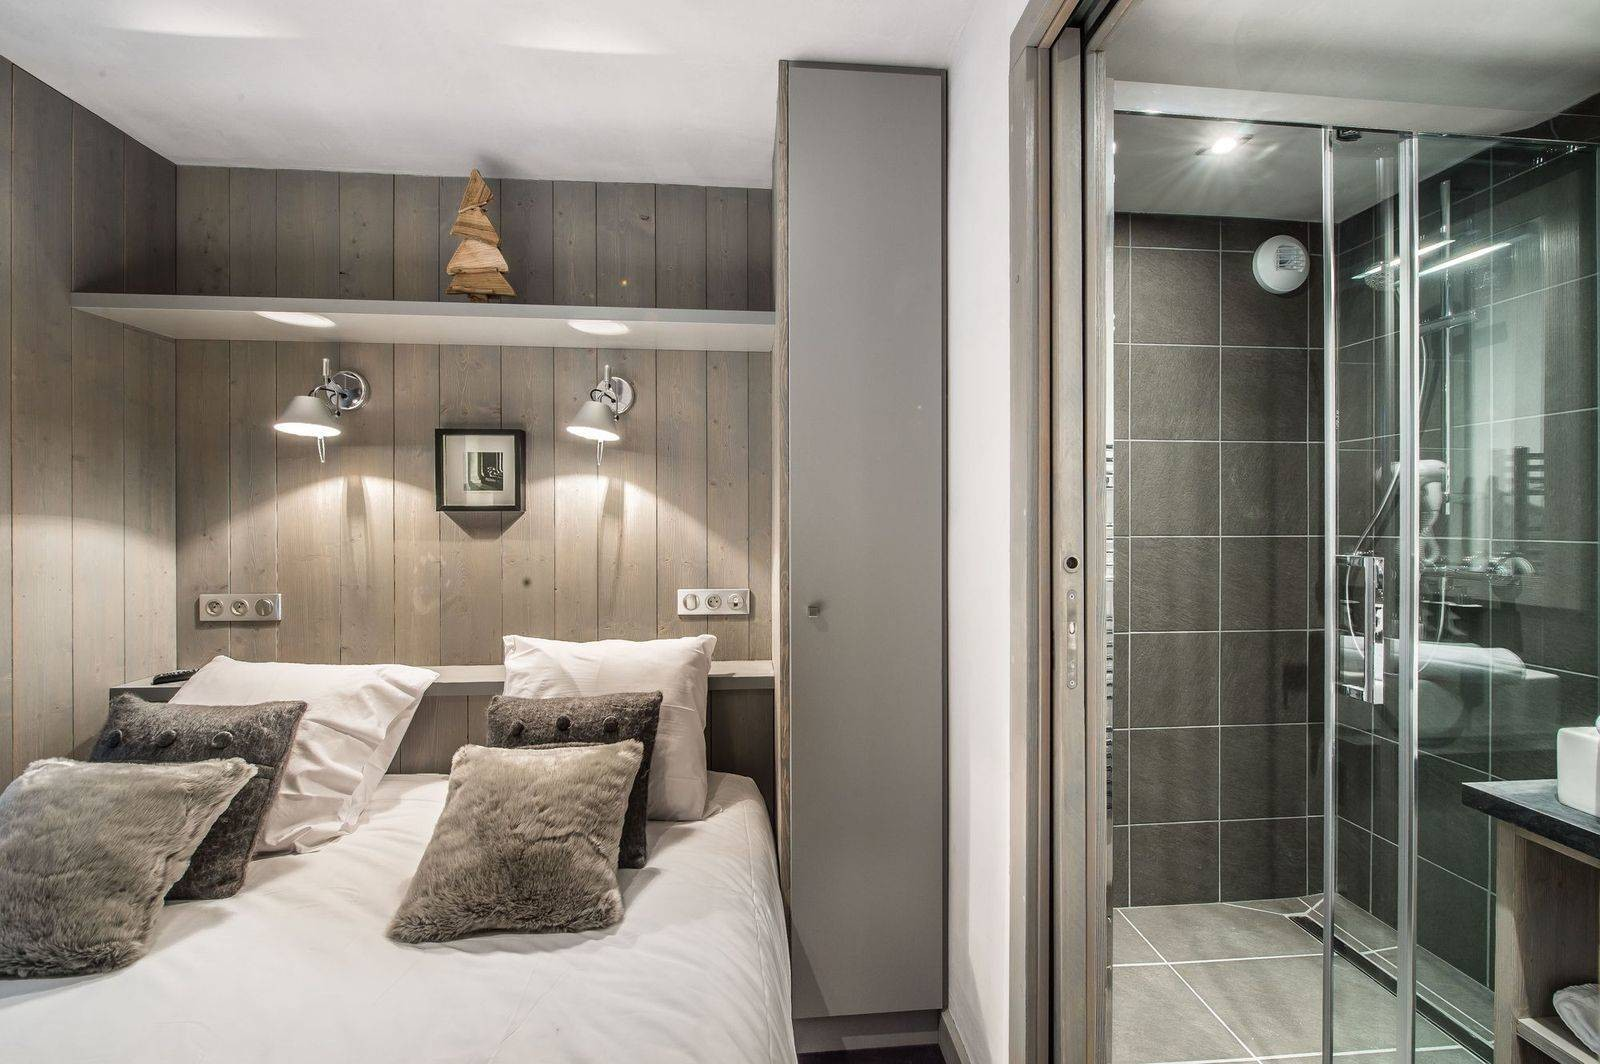 Courchevel 1650 Location Appartement Luxe Dalersi Chambre 4